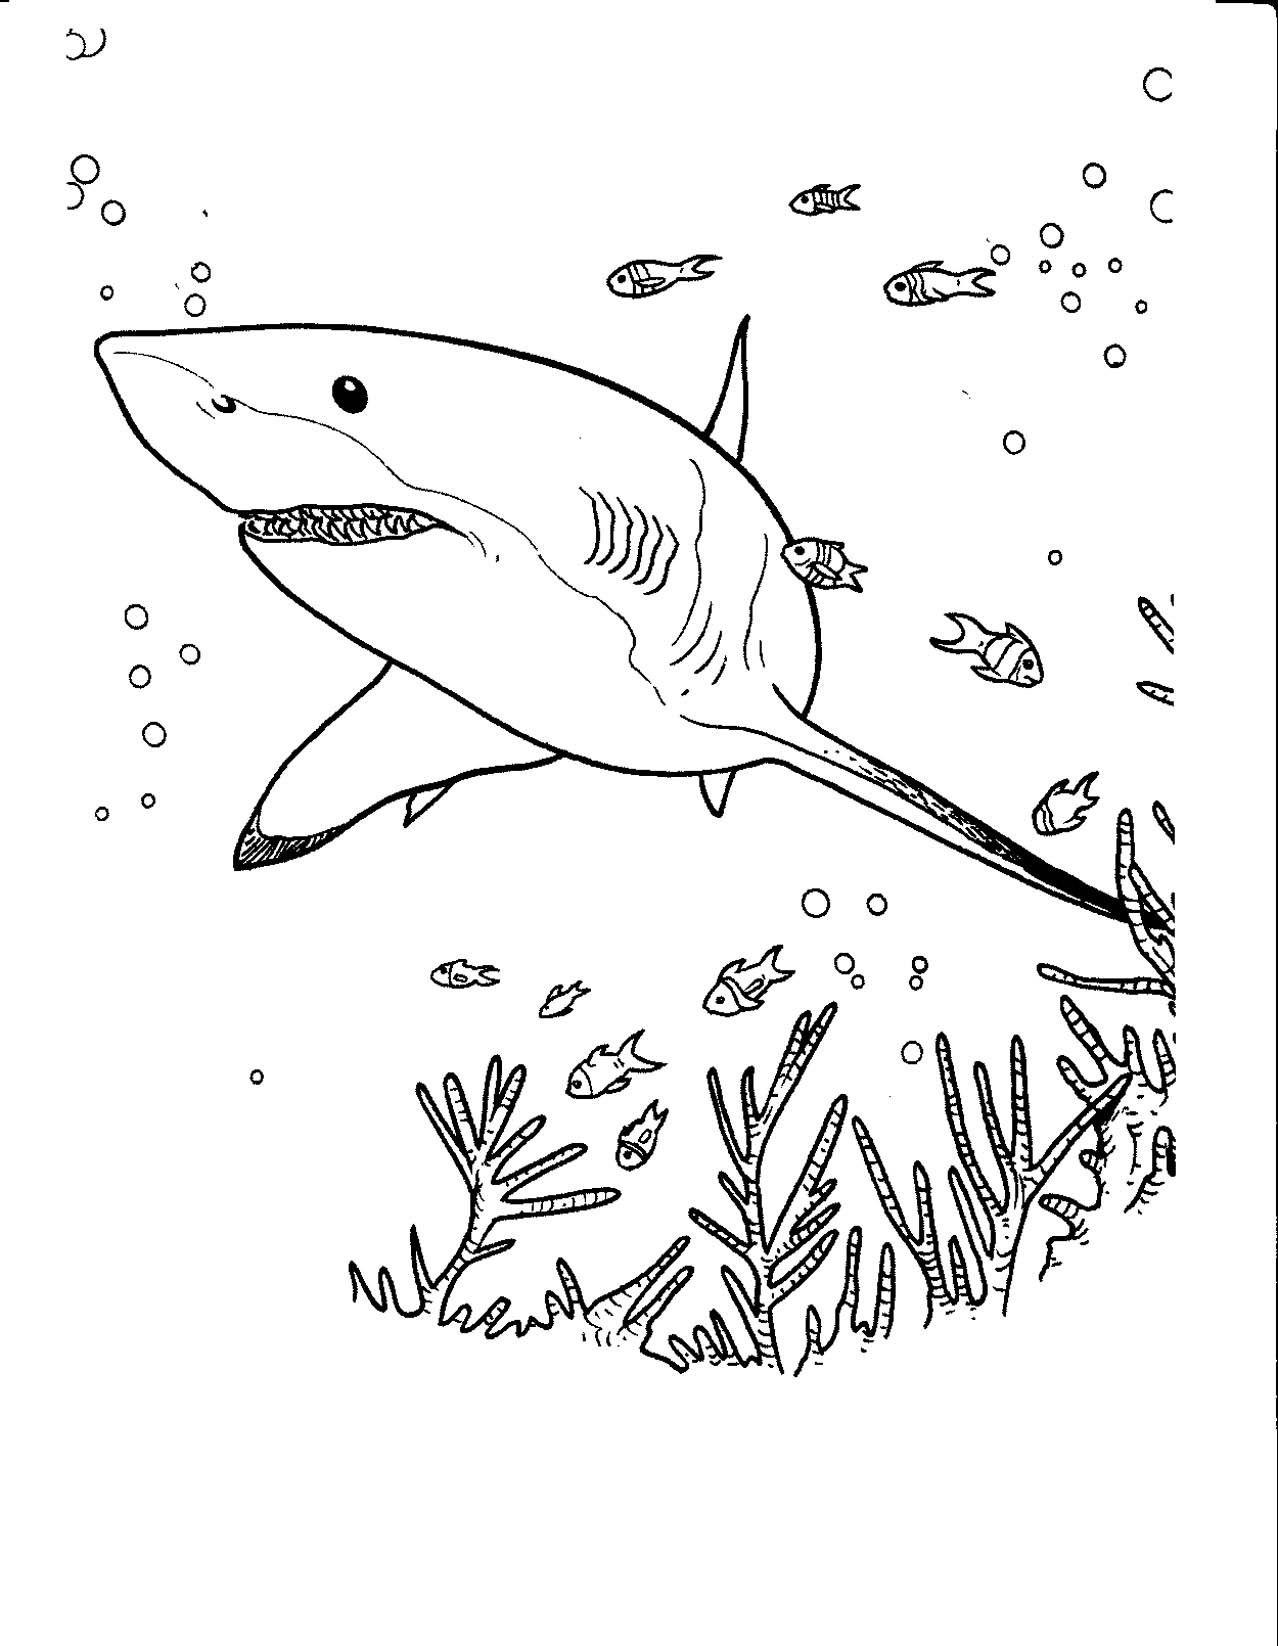 Pin By Nicole Novais On Top Hats Shark Coloring Pages Free Coloring Pages Coloring Pages